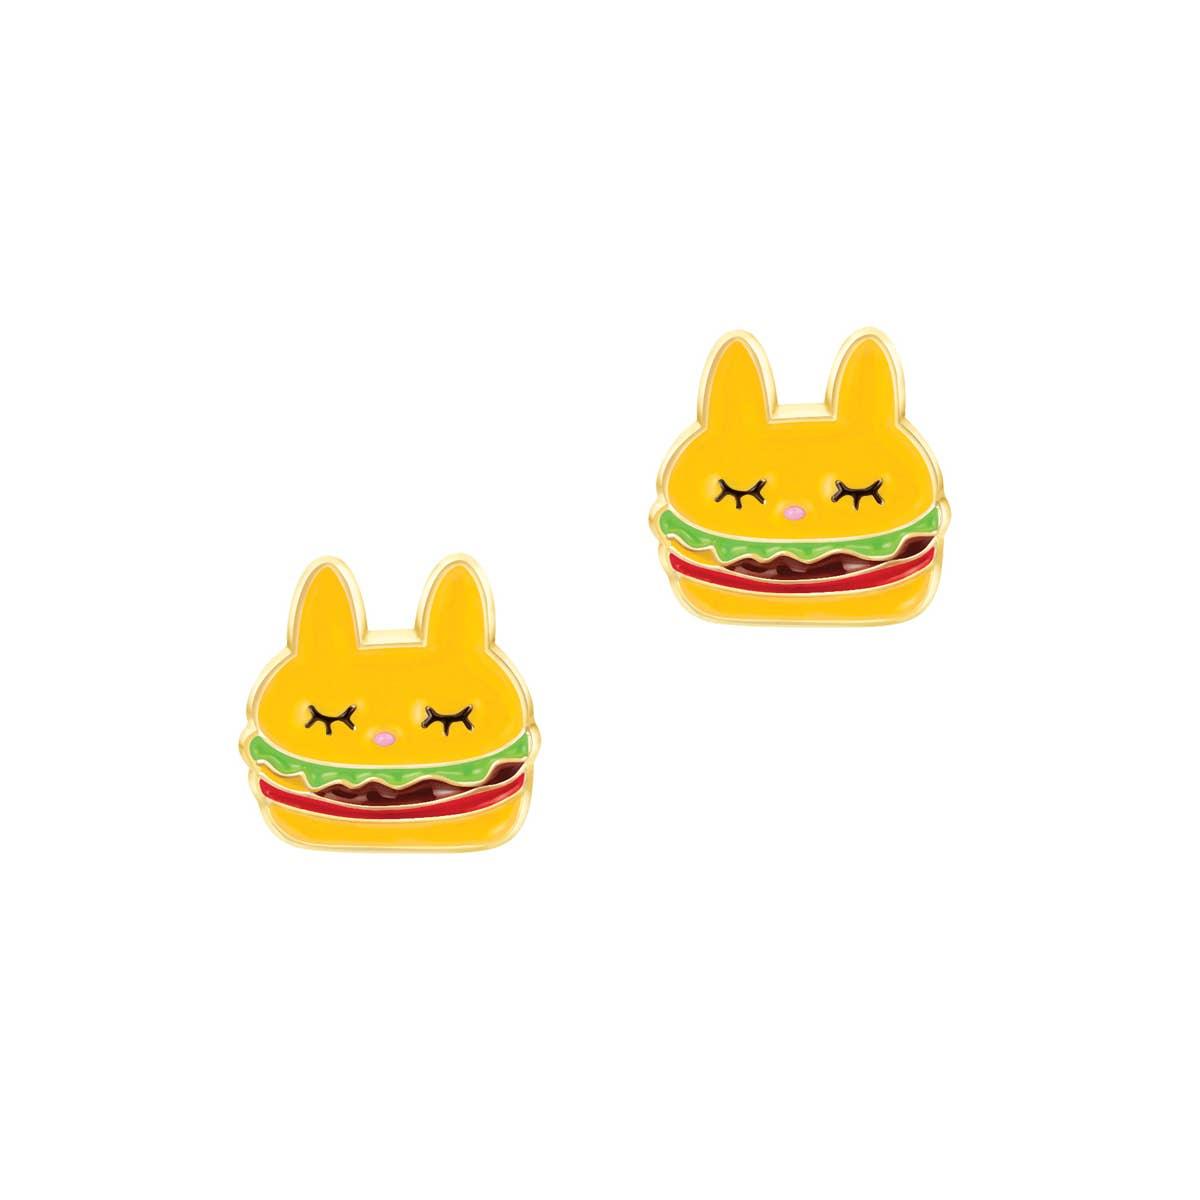 Un-Burger-lievable Cutie Enamel Studs | Trada Marketplace